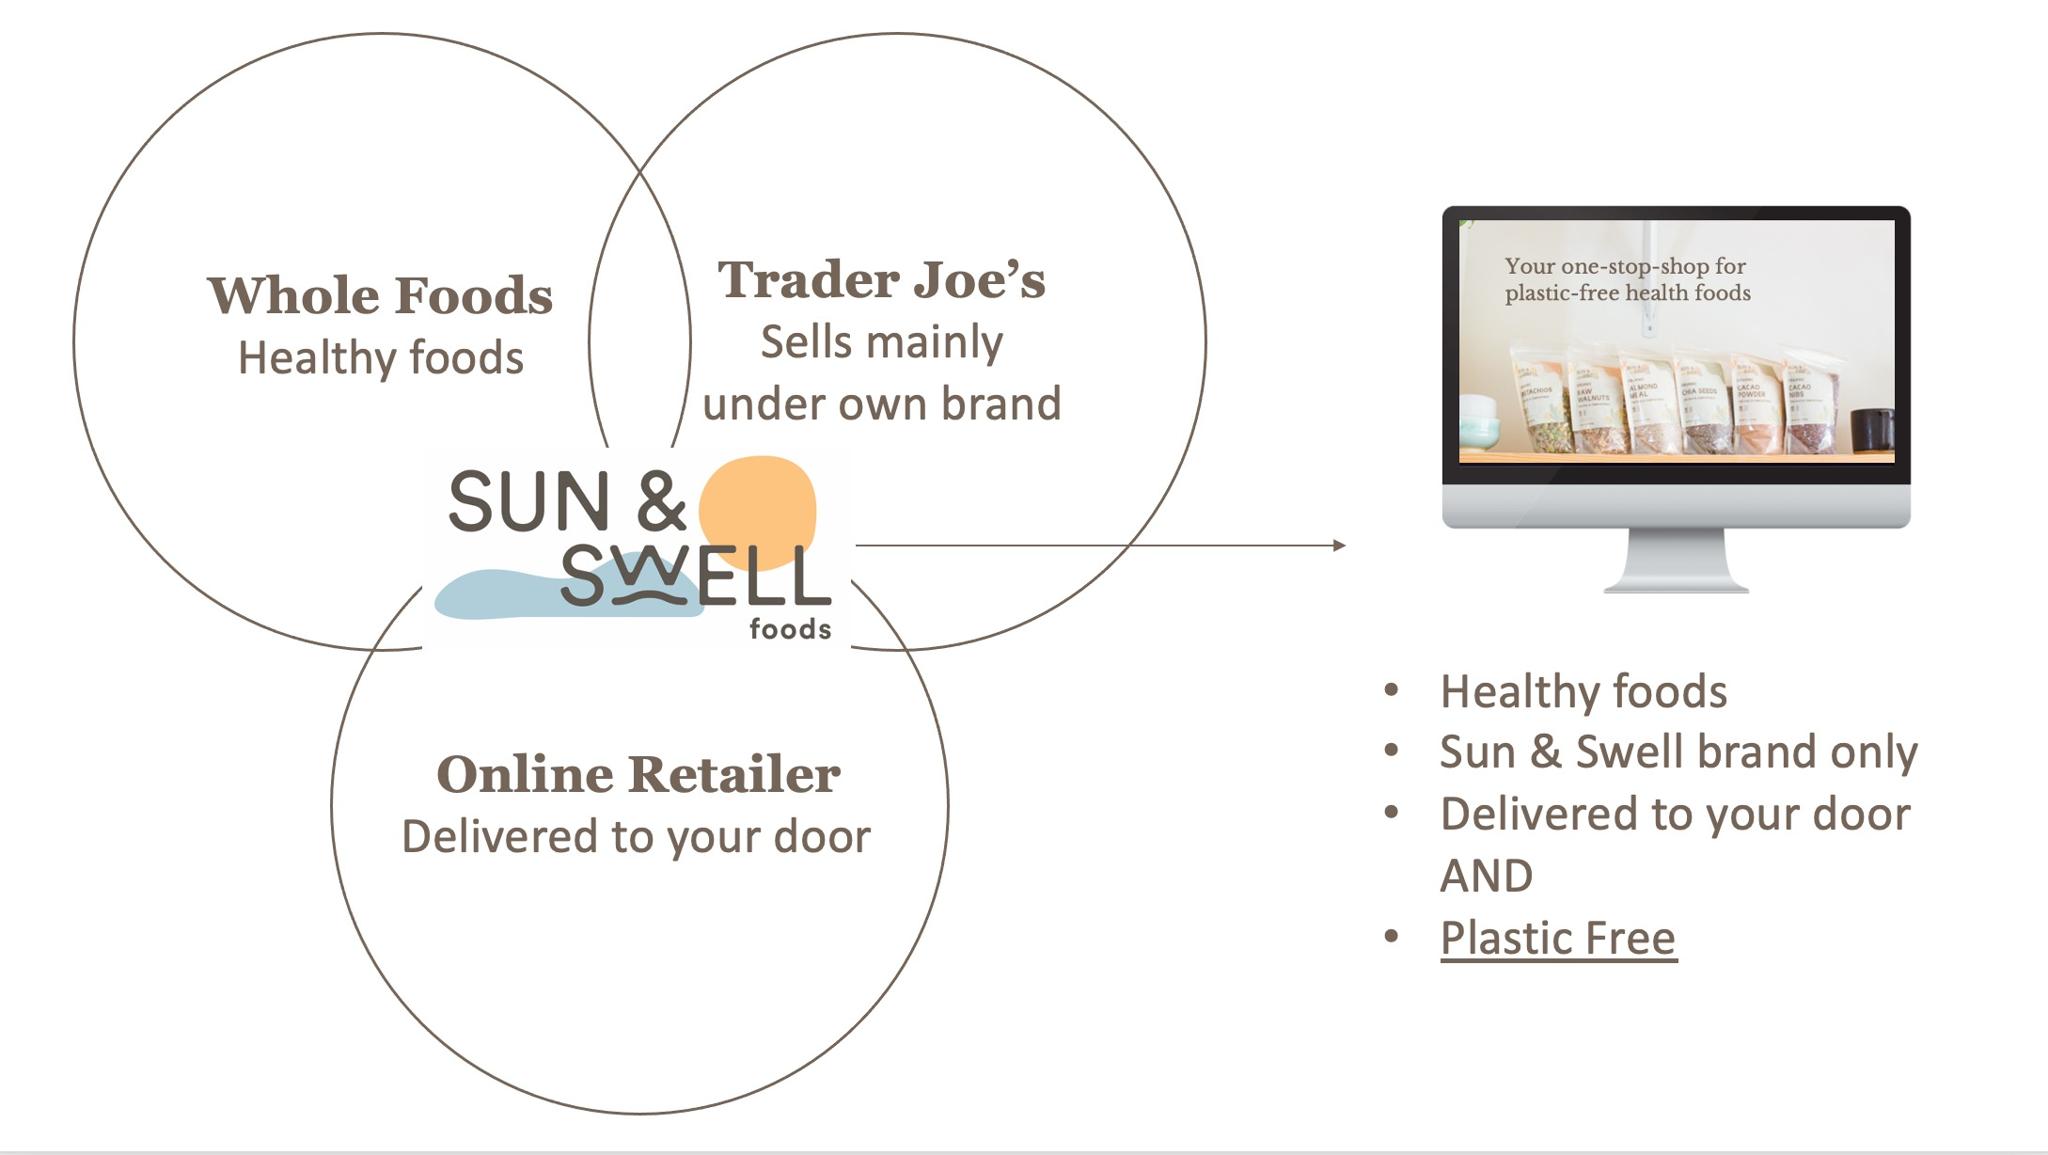 Sun & Swell: A Plastic-Free Health Food Store